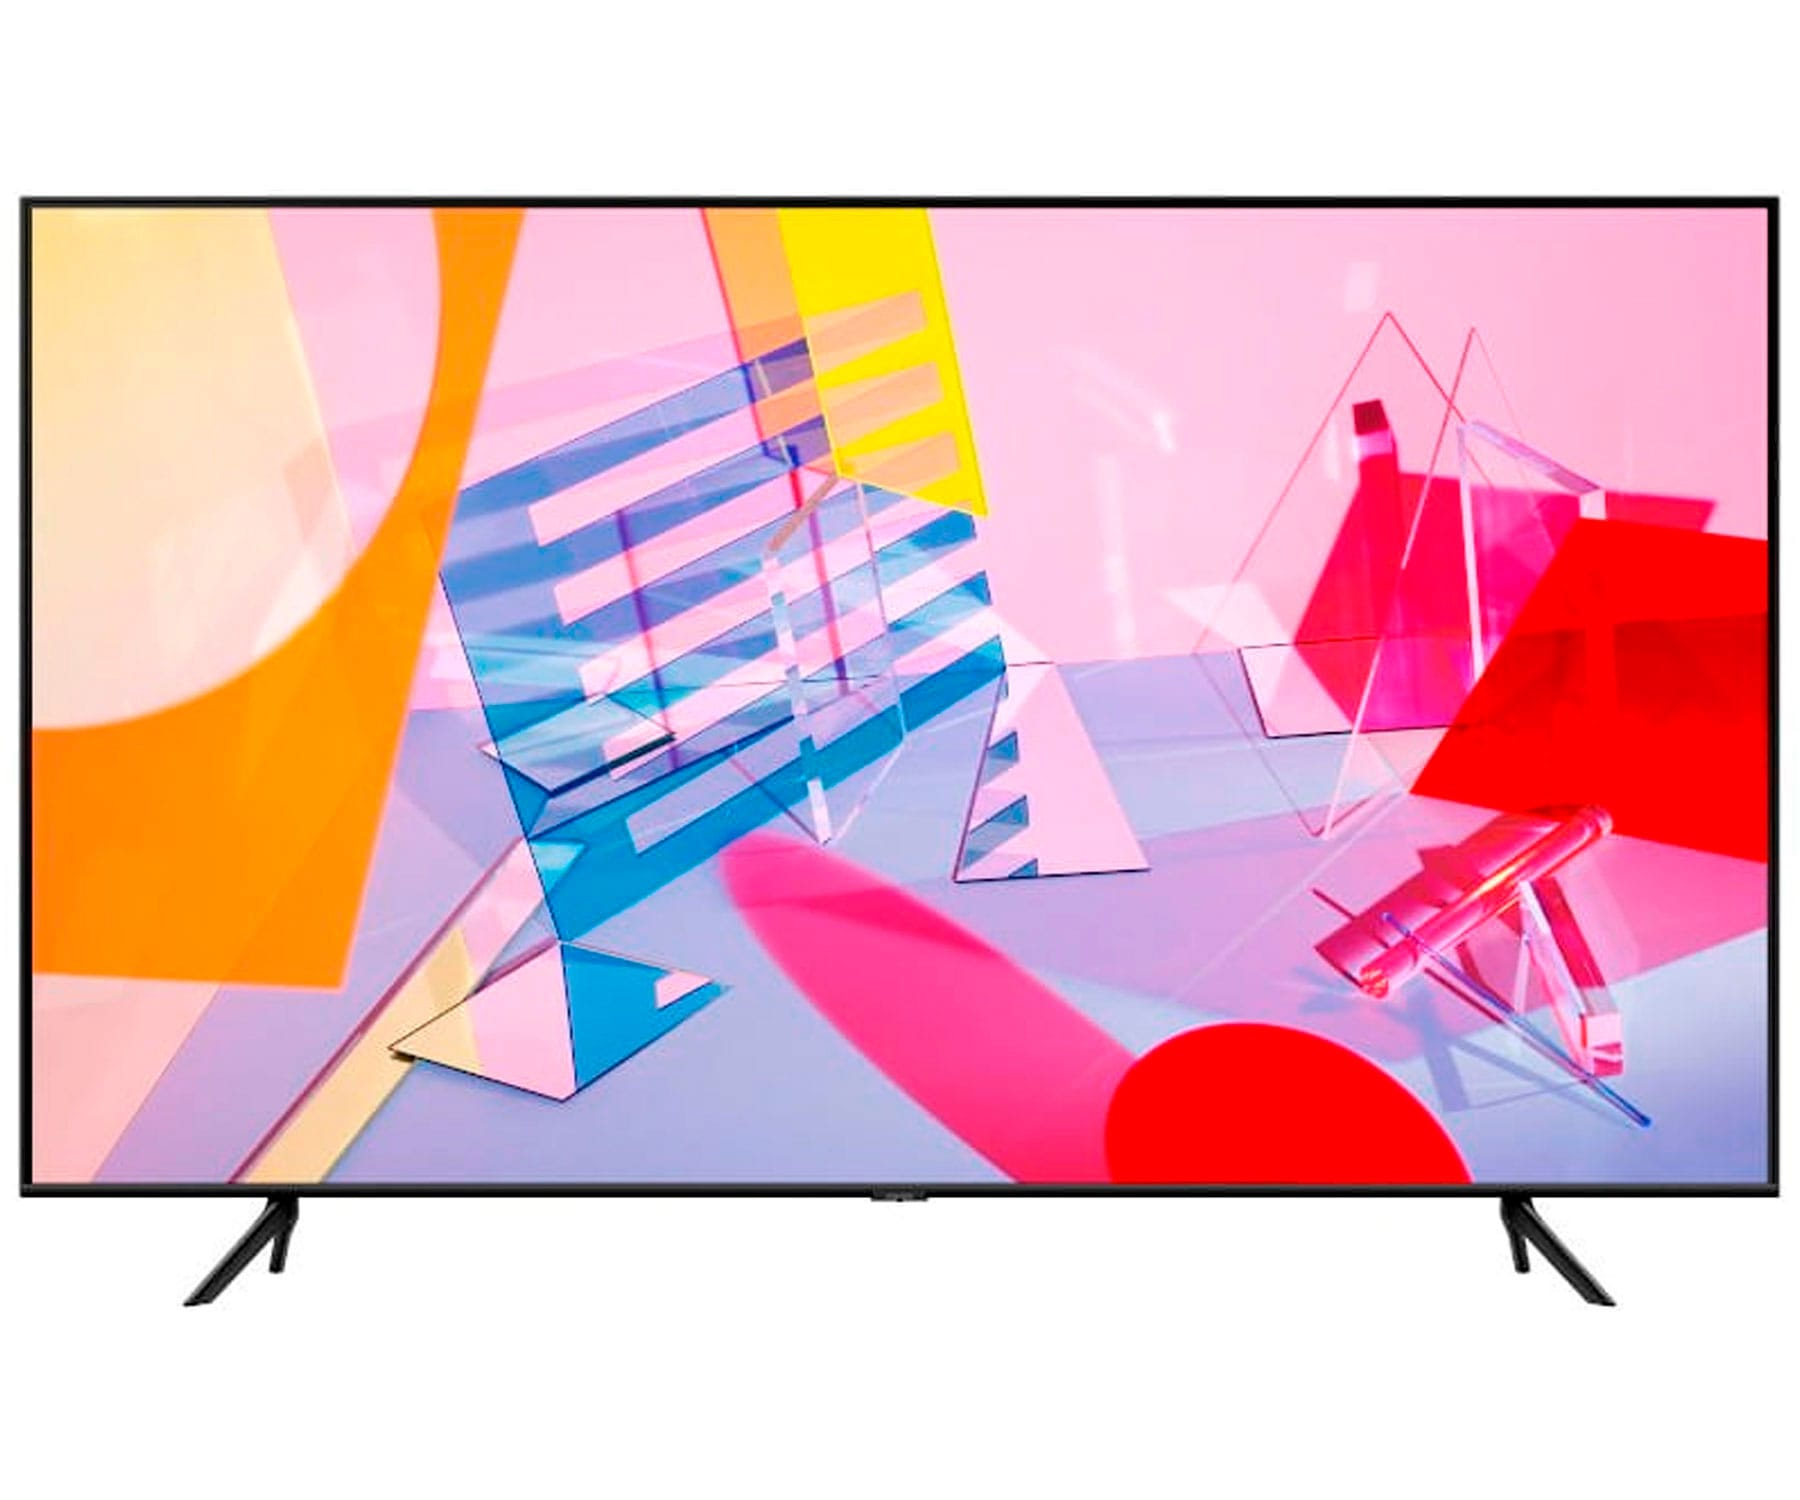 SAMSUNG QE50Q60TAU NEGRO TELEVISOR 50'' QLED 4K SMART TV WIFI BLUETOOTH AMBIENT MODE